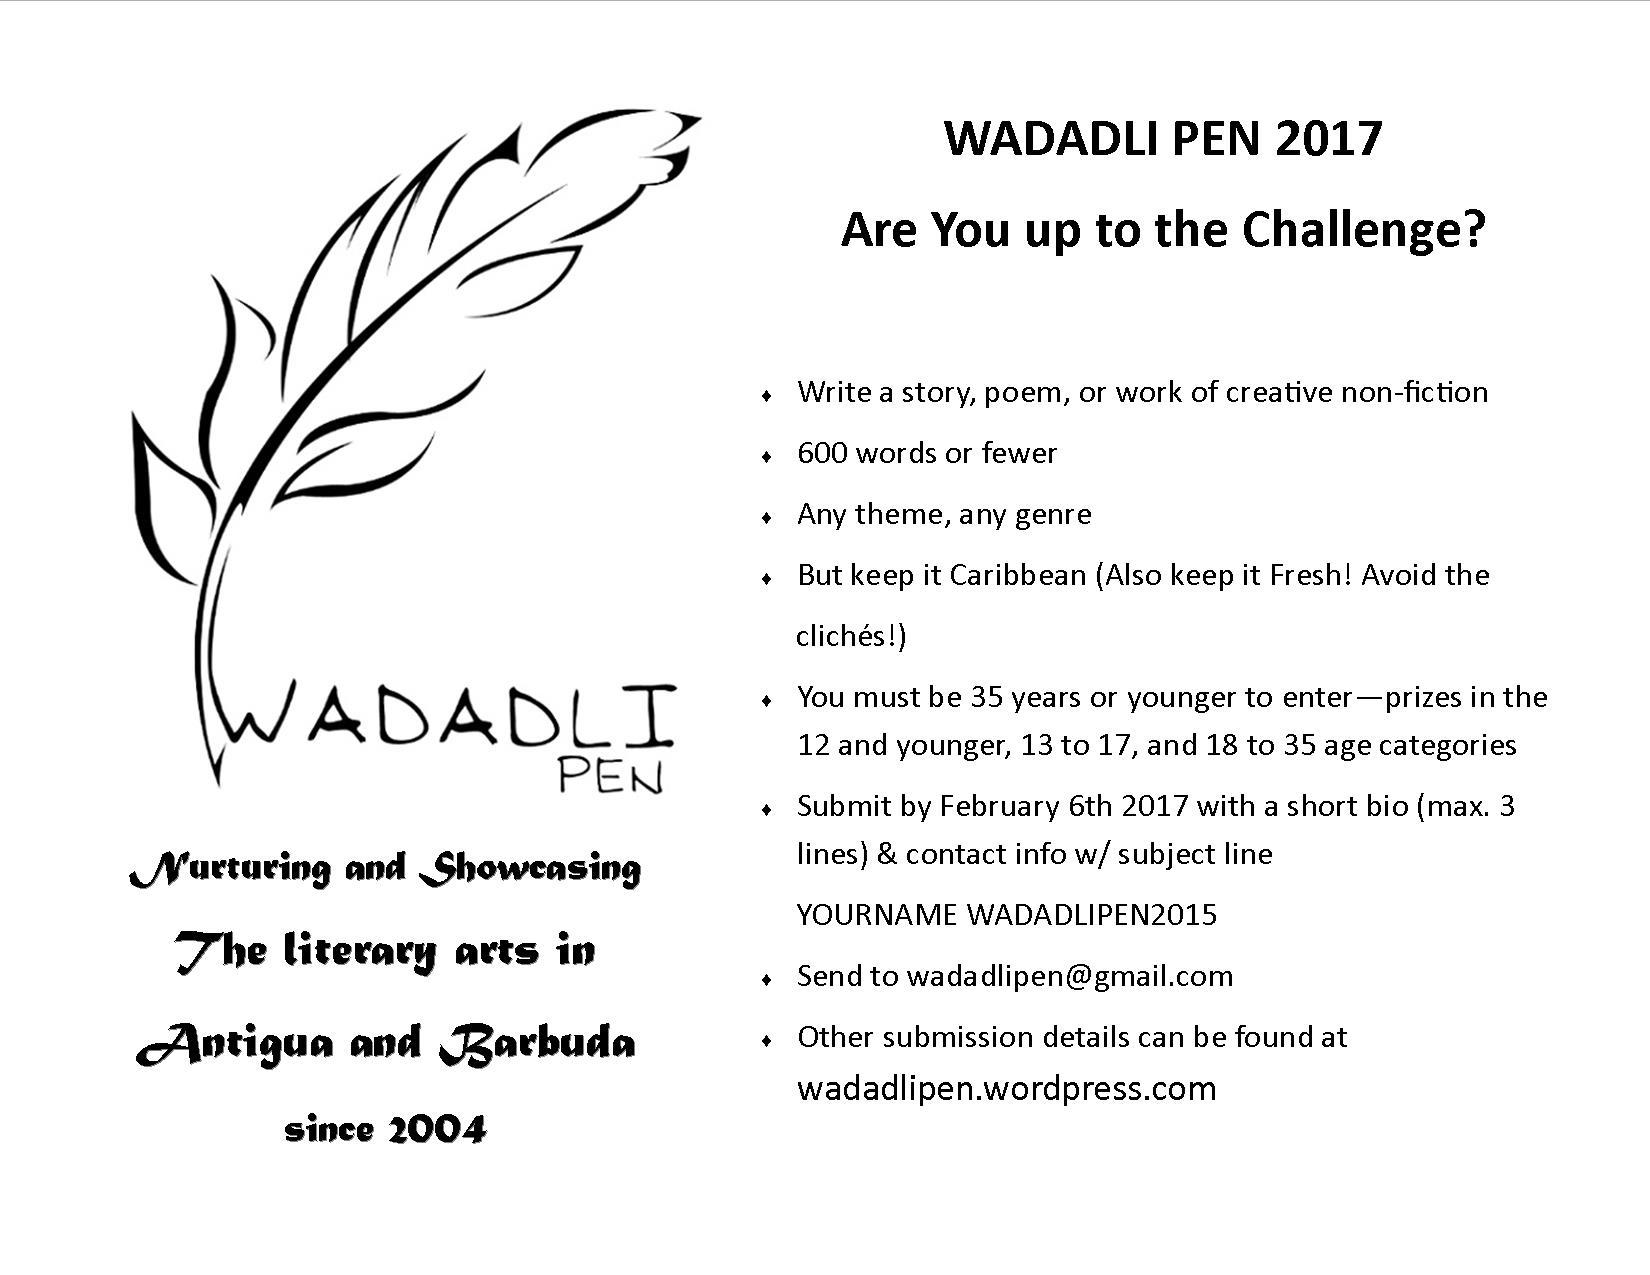 wadadli-pen-2017-flyer